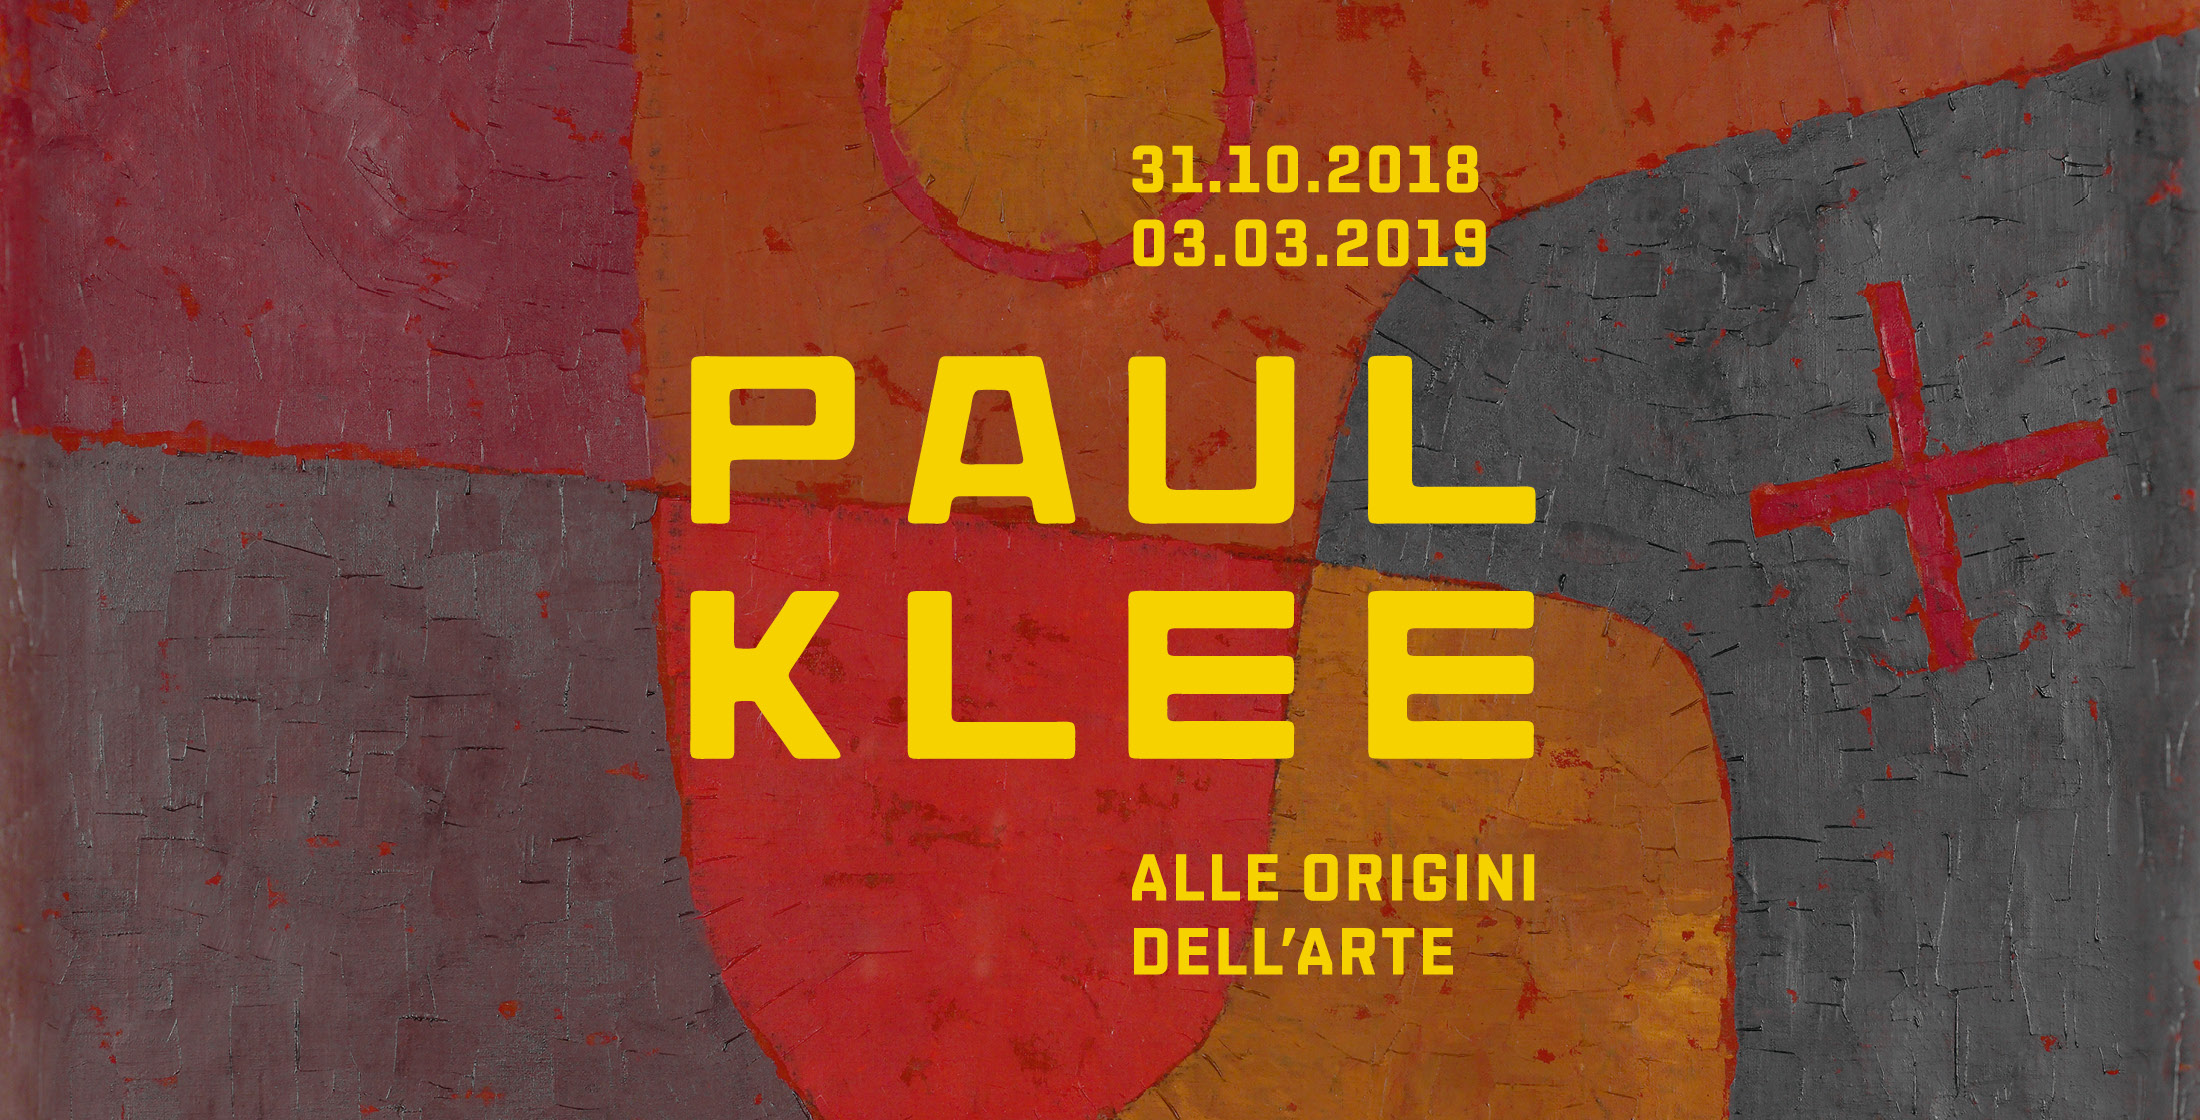 PAUL KLEE – ALLE ORIGINI DELL'ARTE